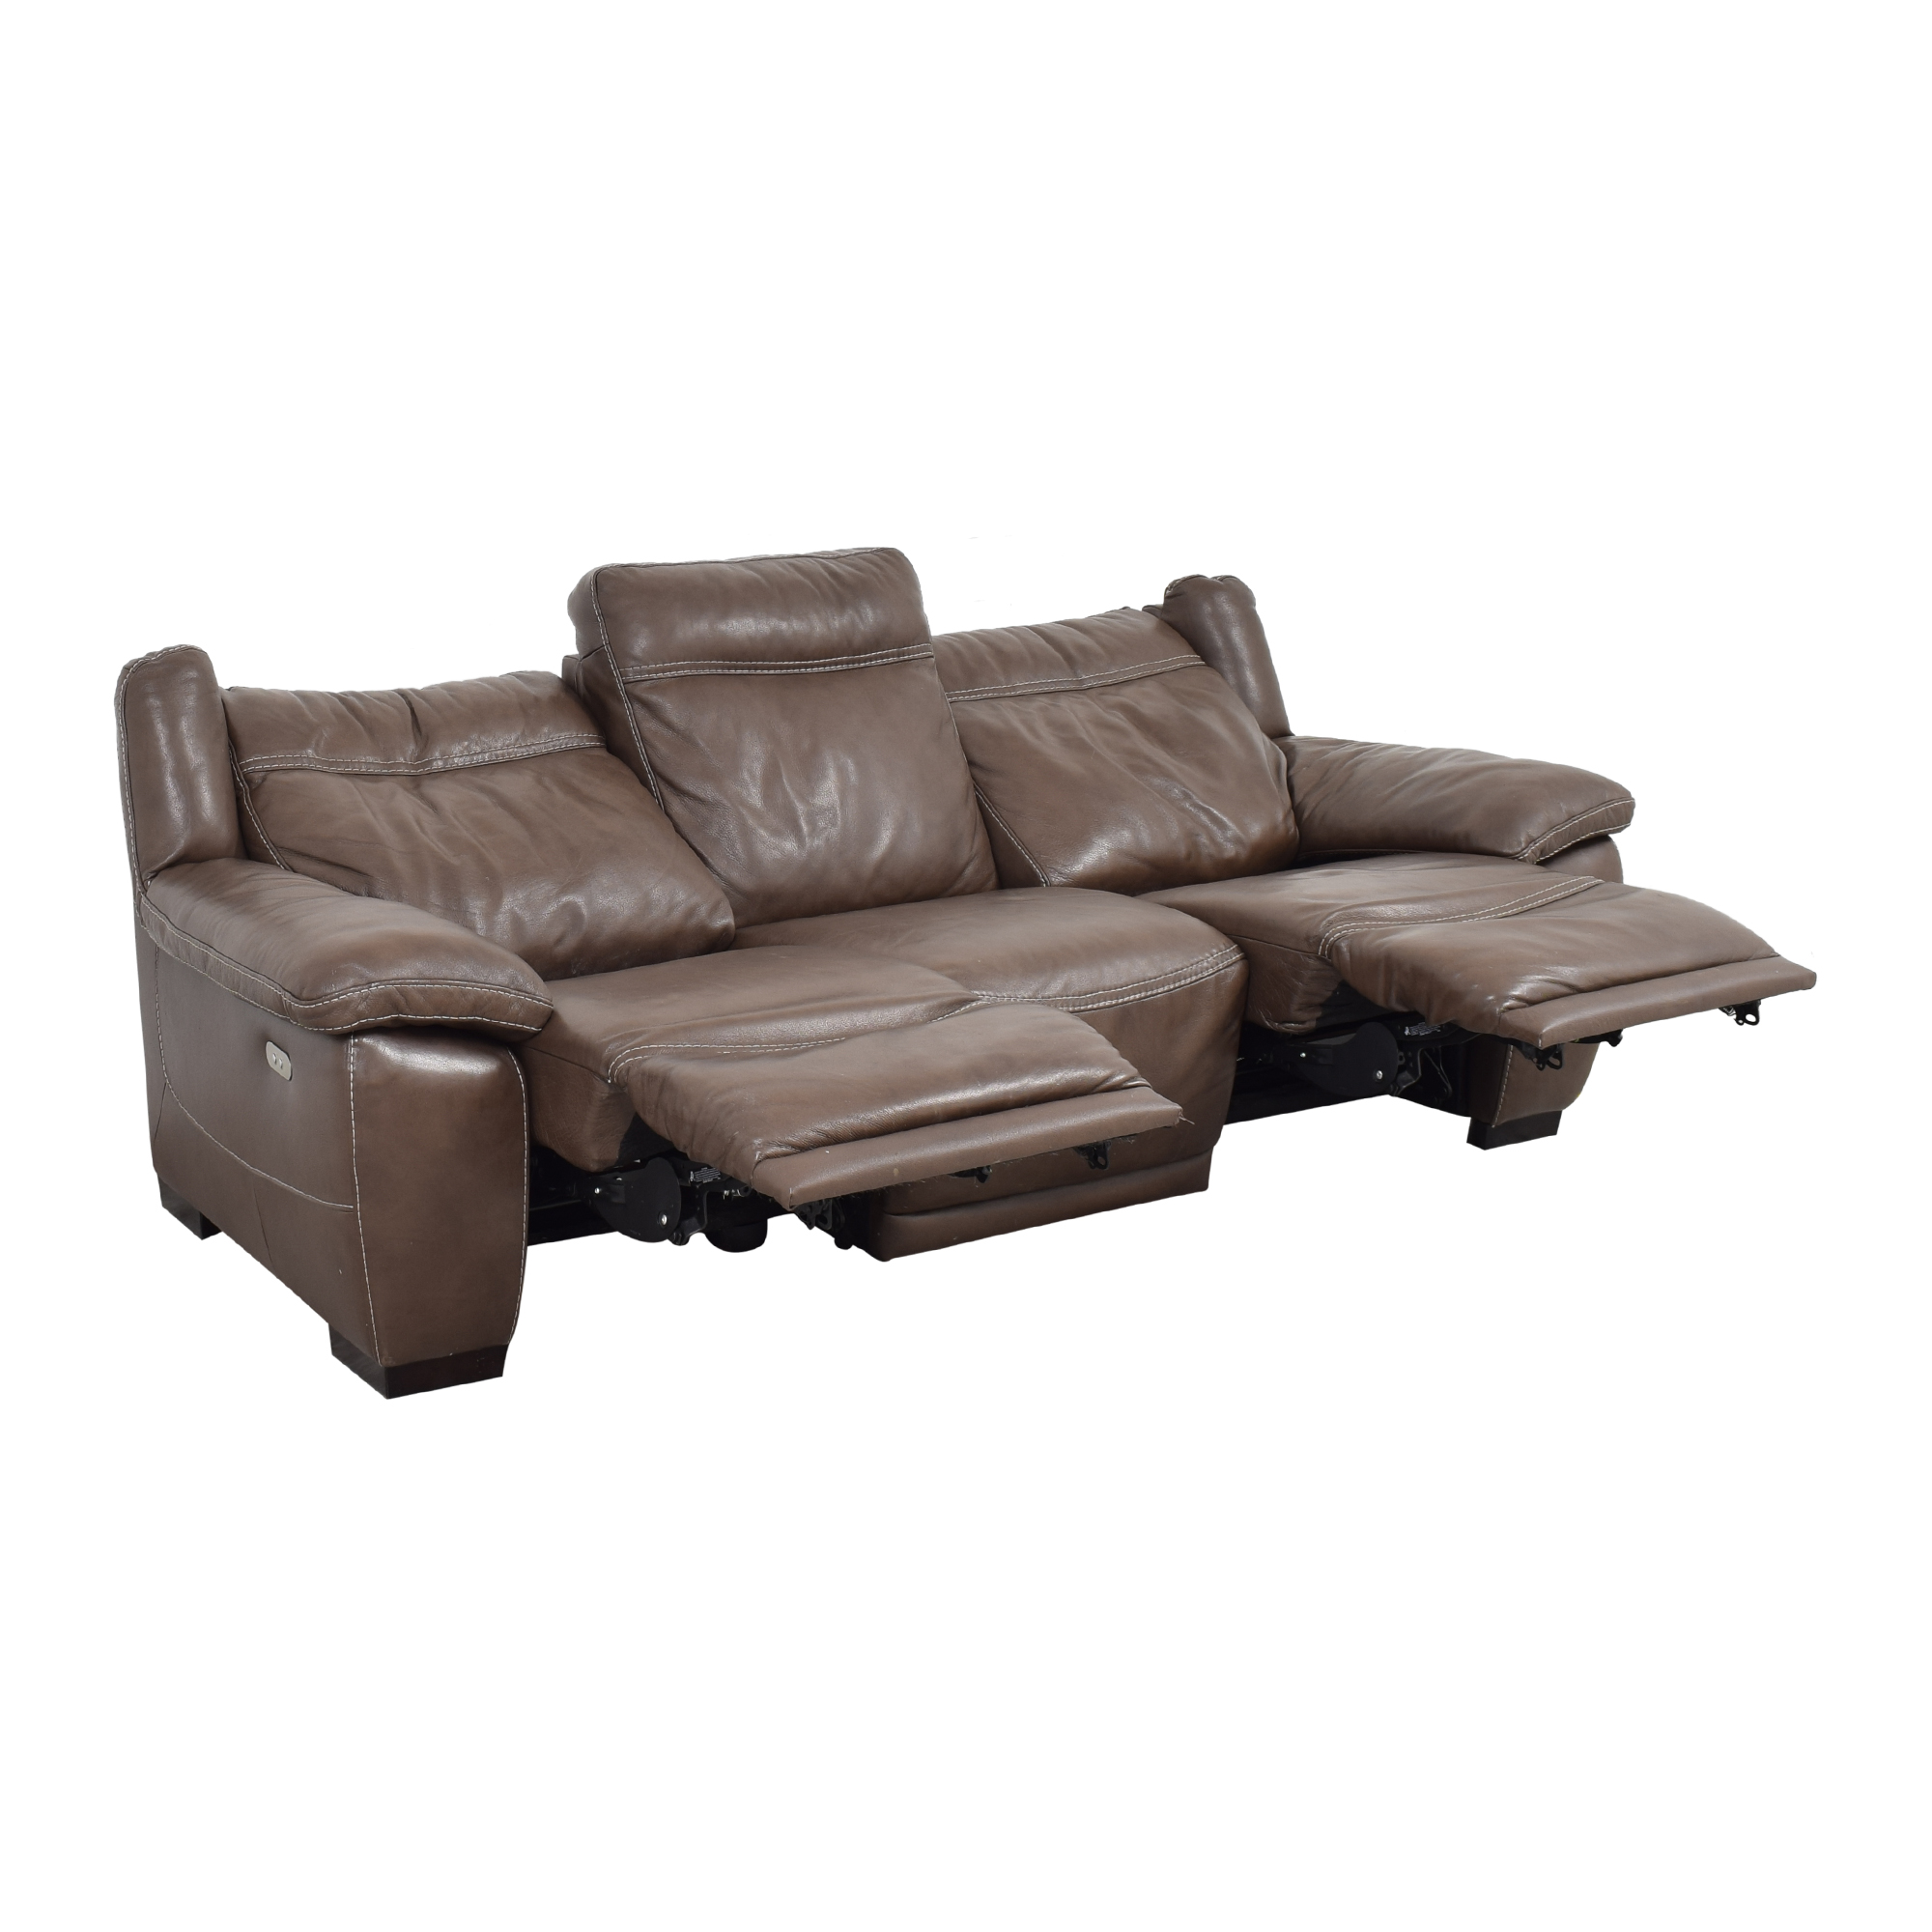 Natuzzi Natuzzi Three Cushion Reclining Sofa ct